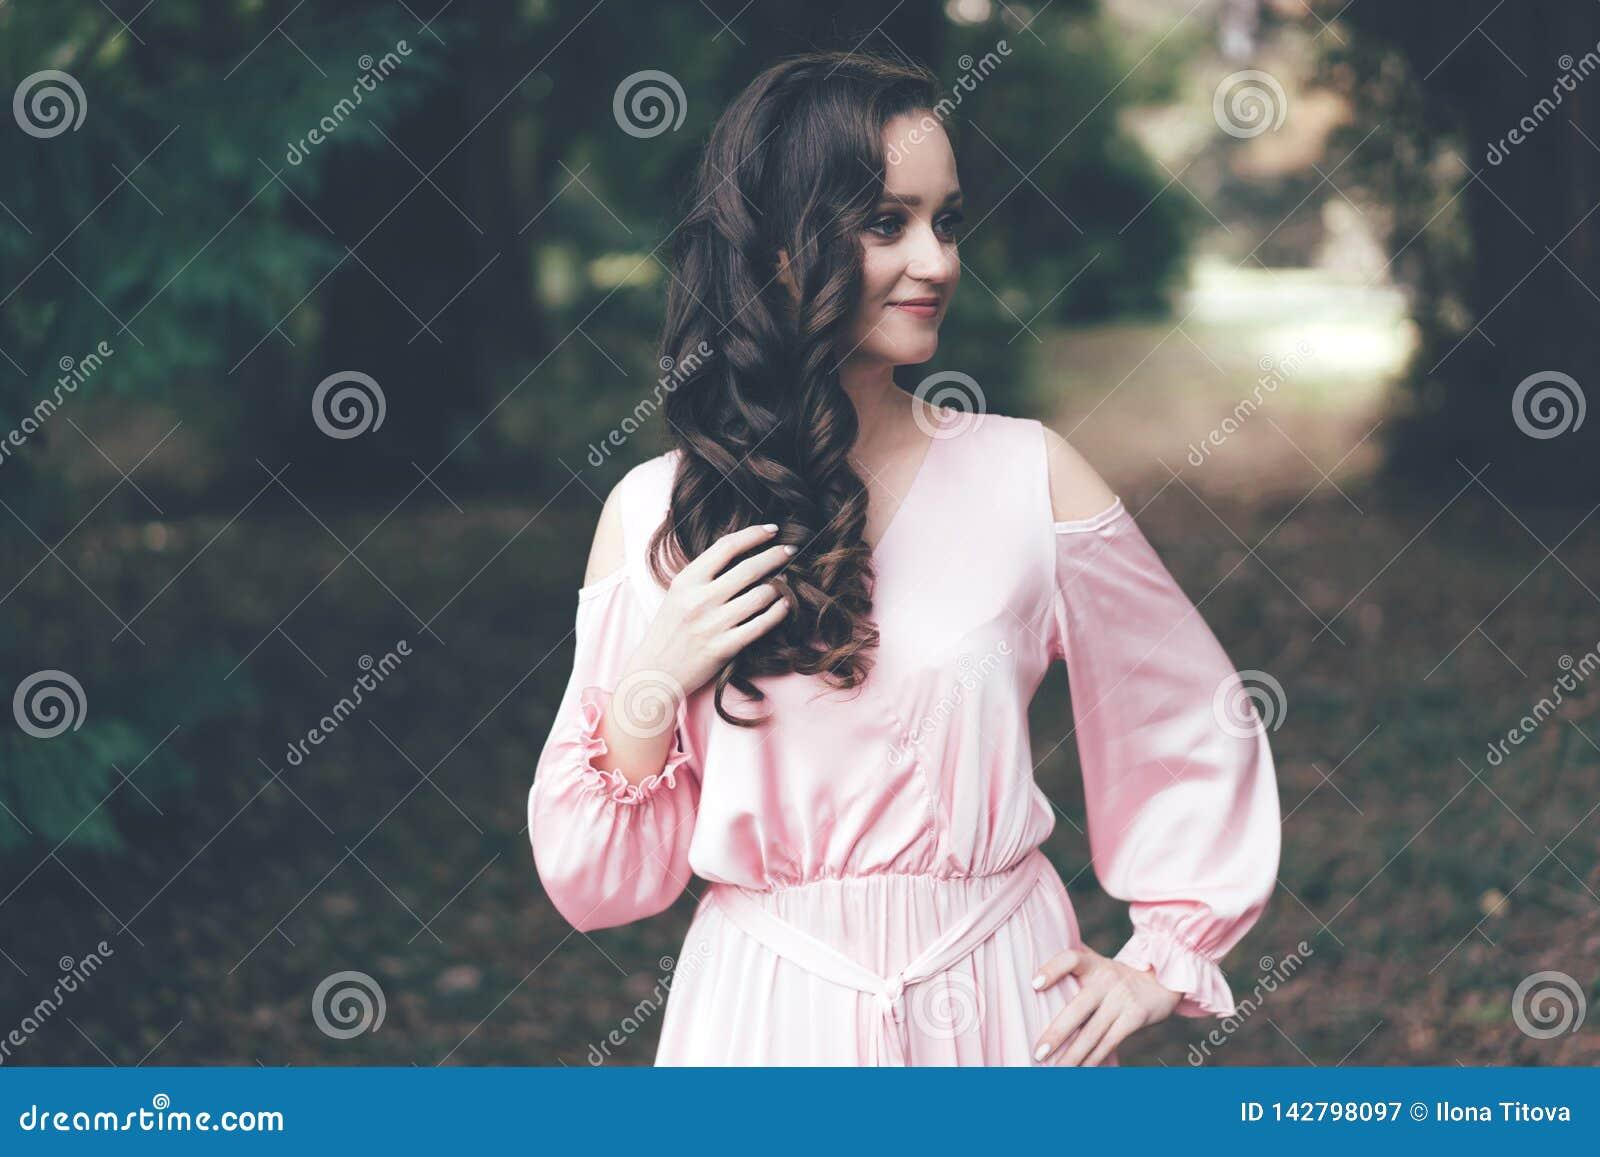 Sweet brunette with curls in a dress